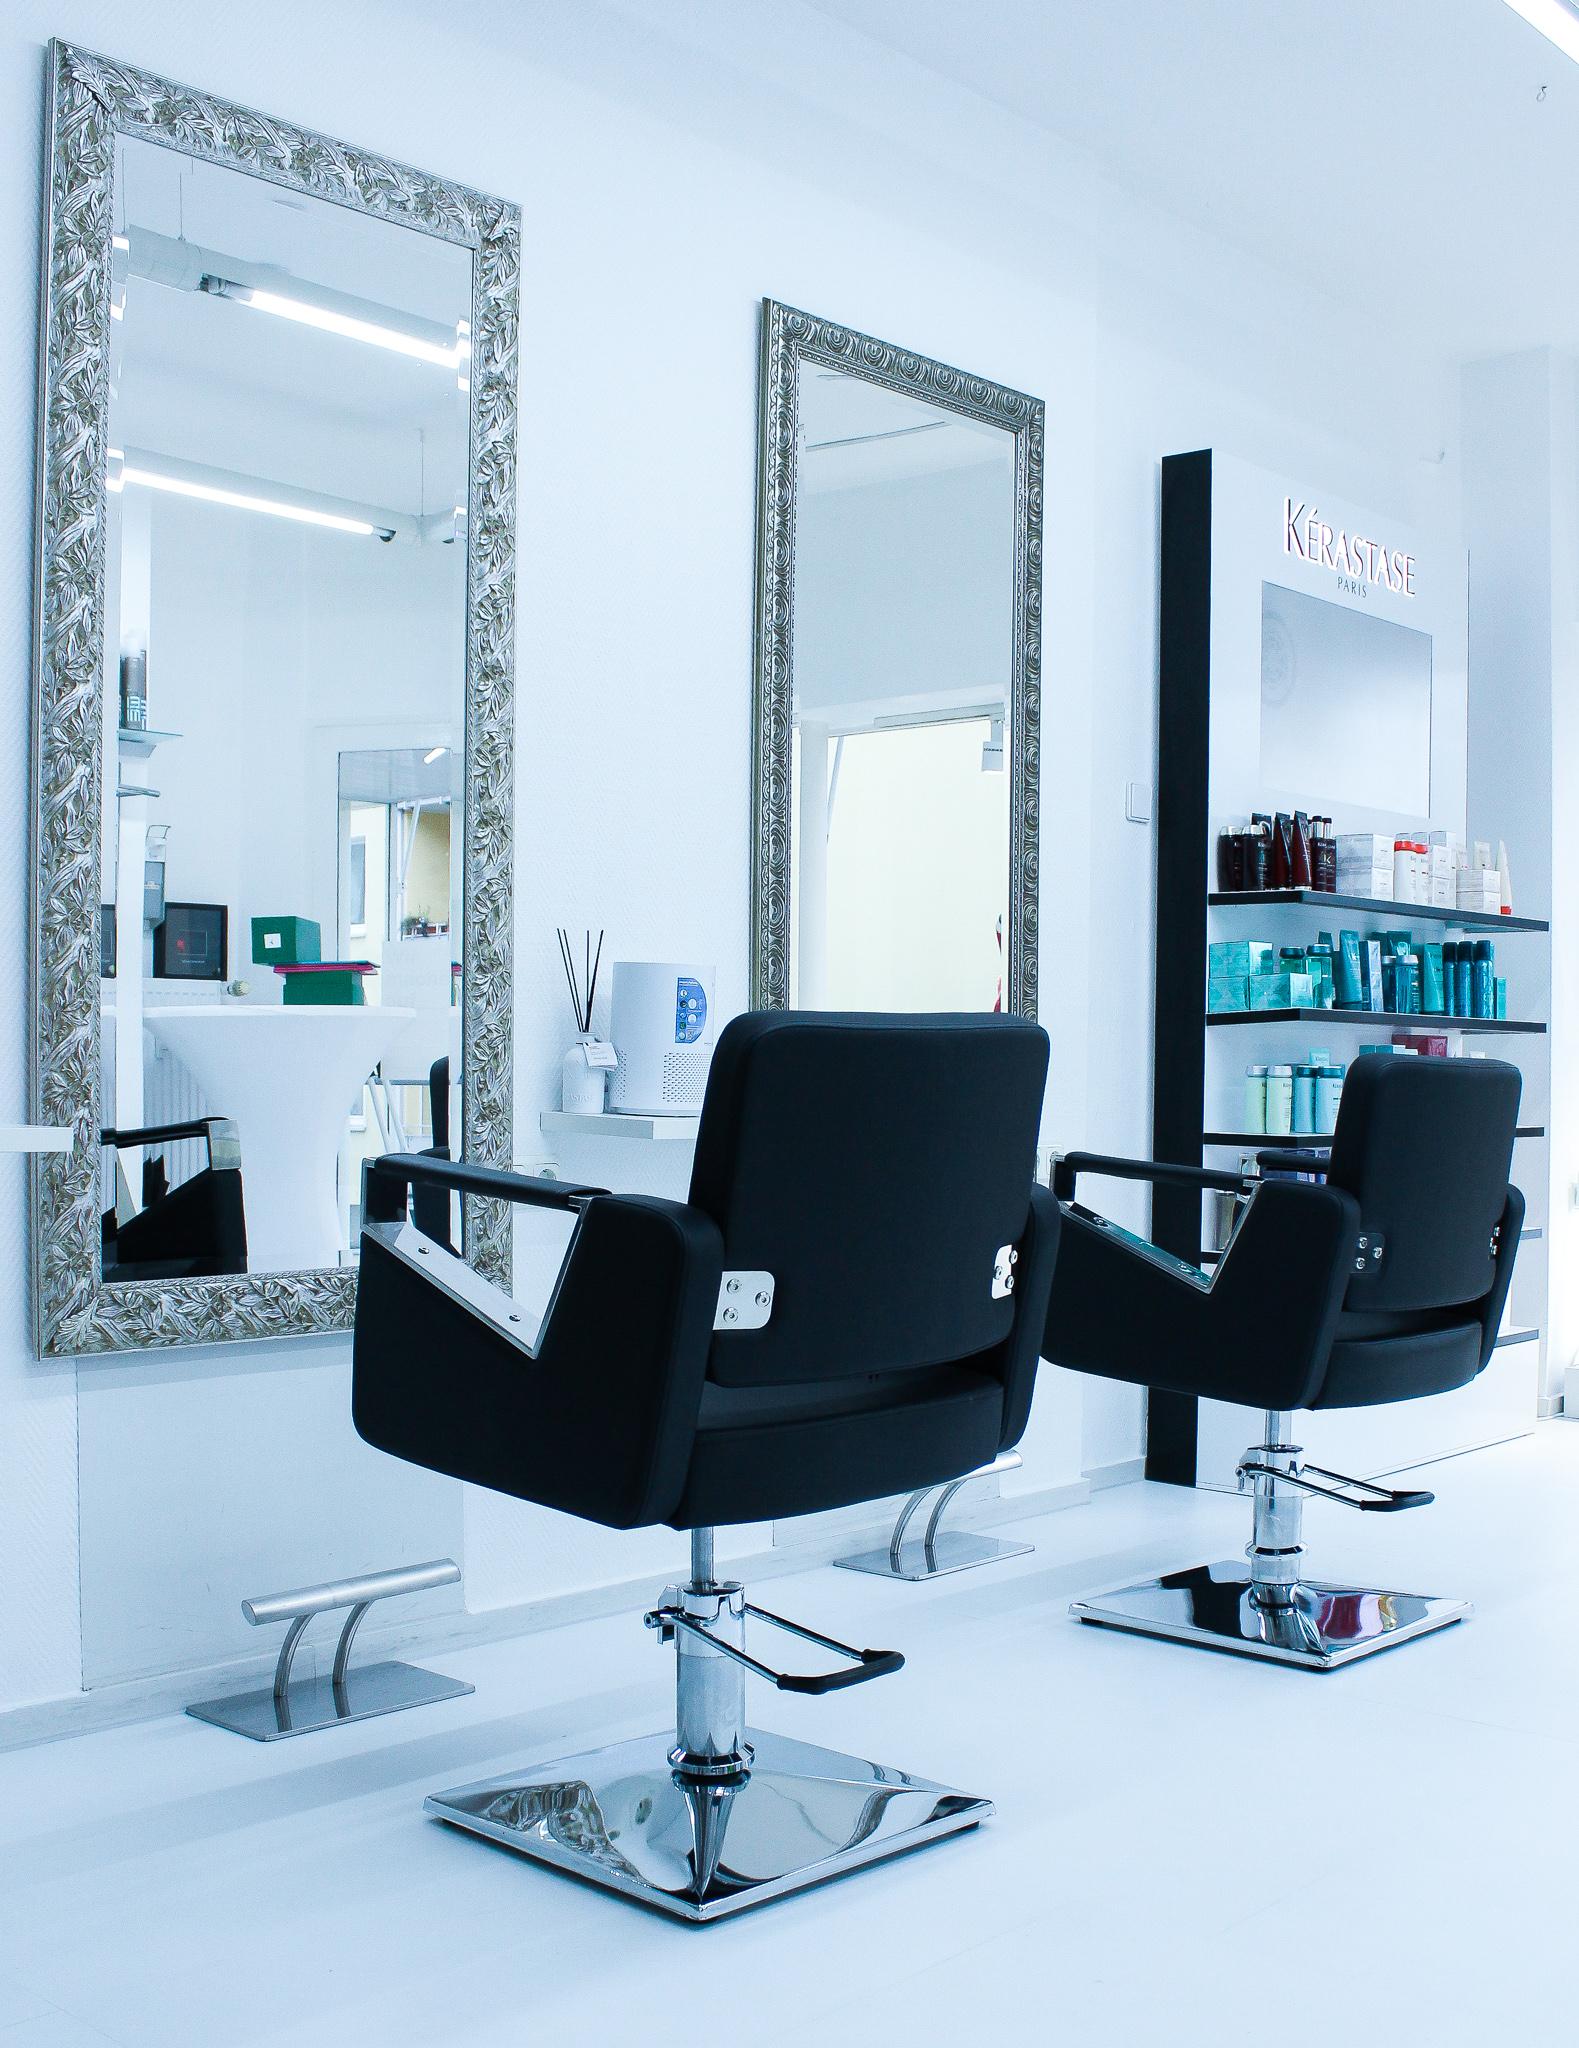 Friseursalon Leichlingen   Friseur & Kosmetik Leichlingen   Salon ...